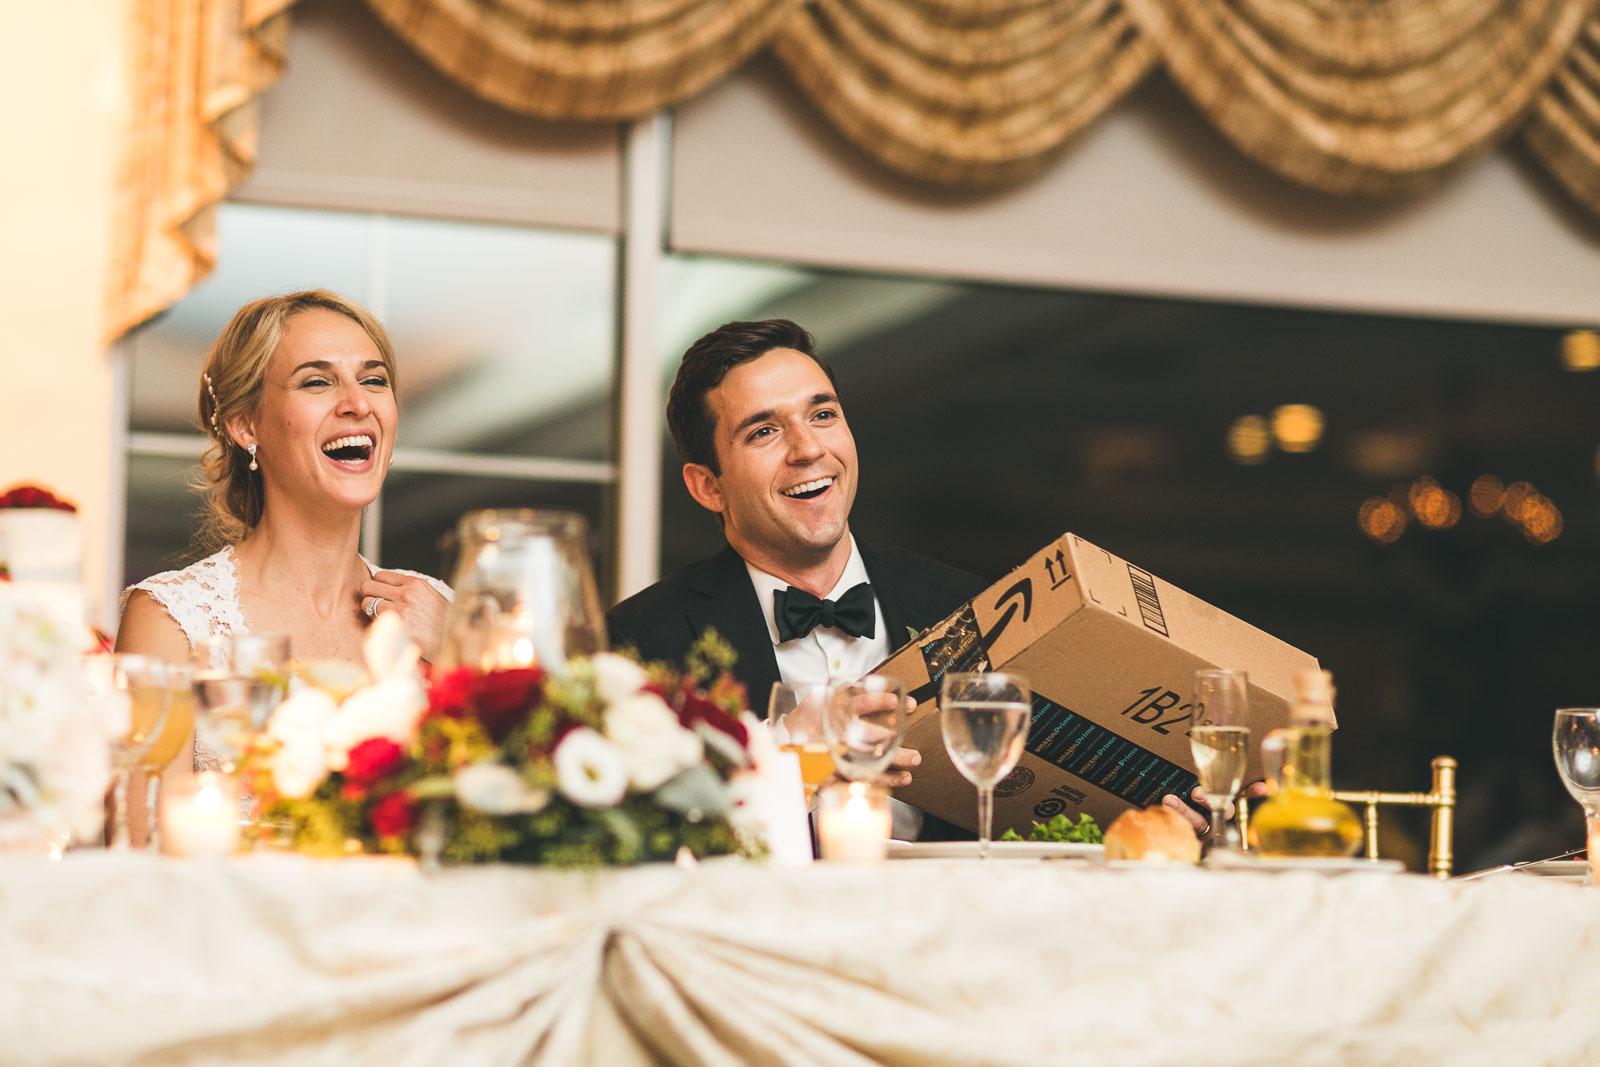 Wedding Gift Tradition